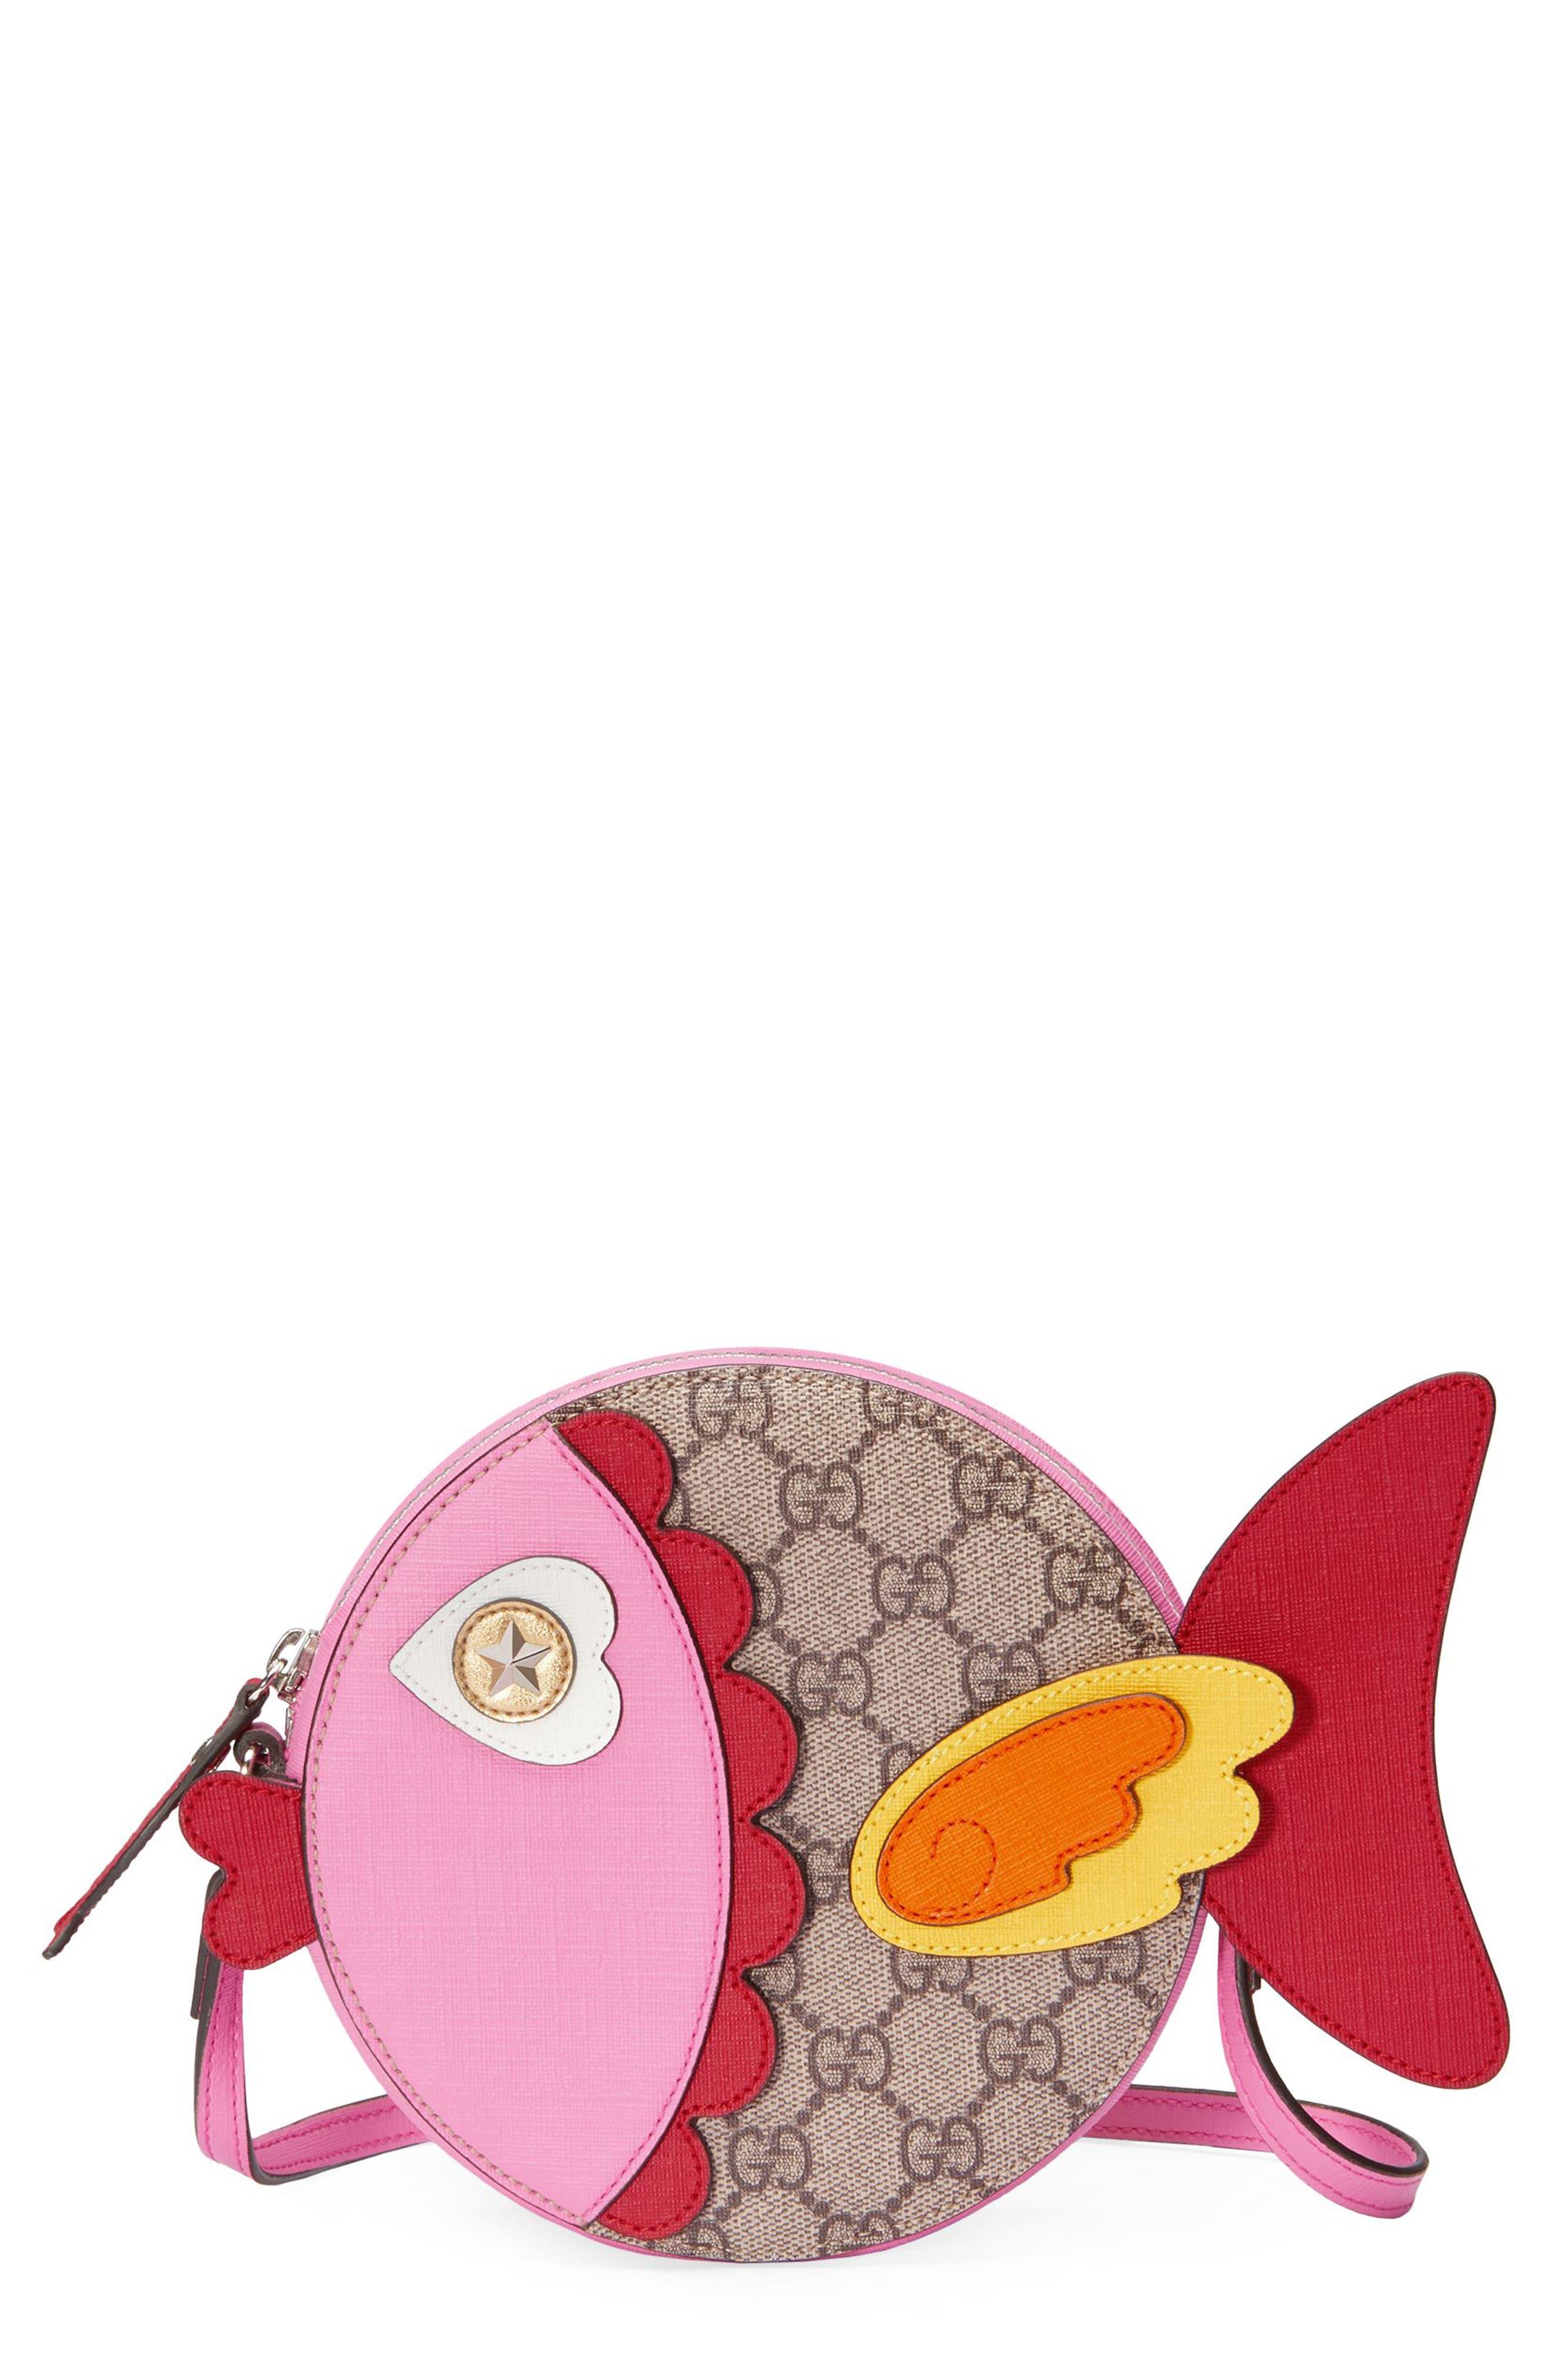 Gucci GG Supreme Fish Canvas Shoulder Bag,                         Main,                         color, 204